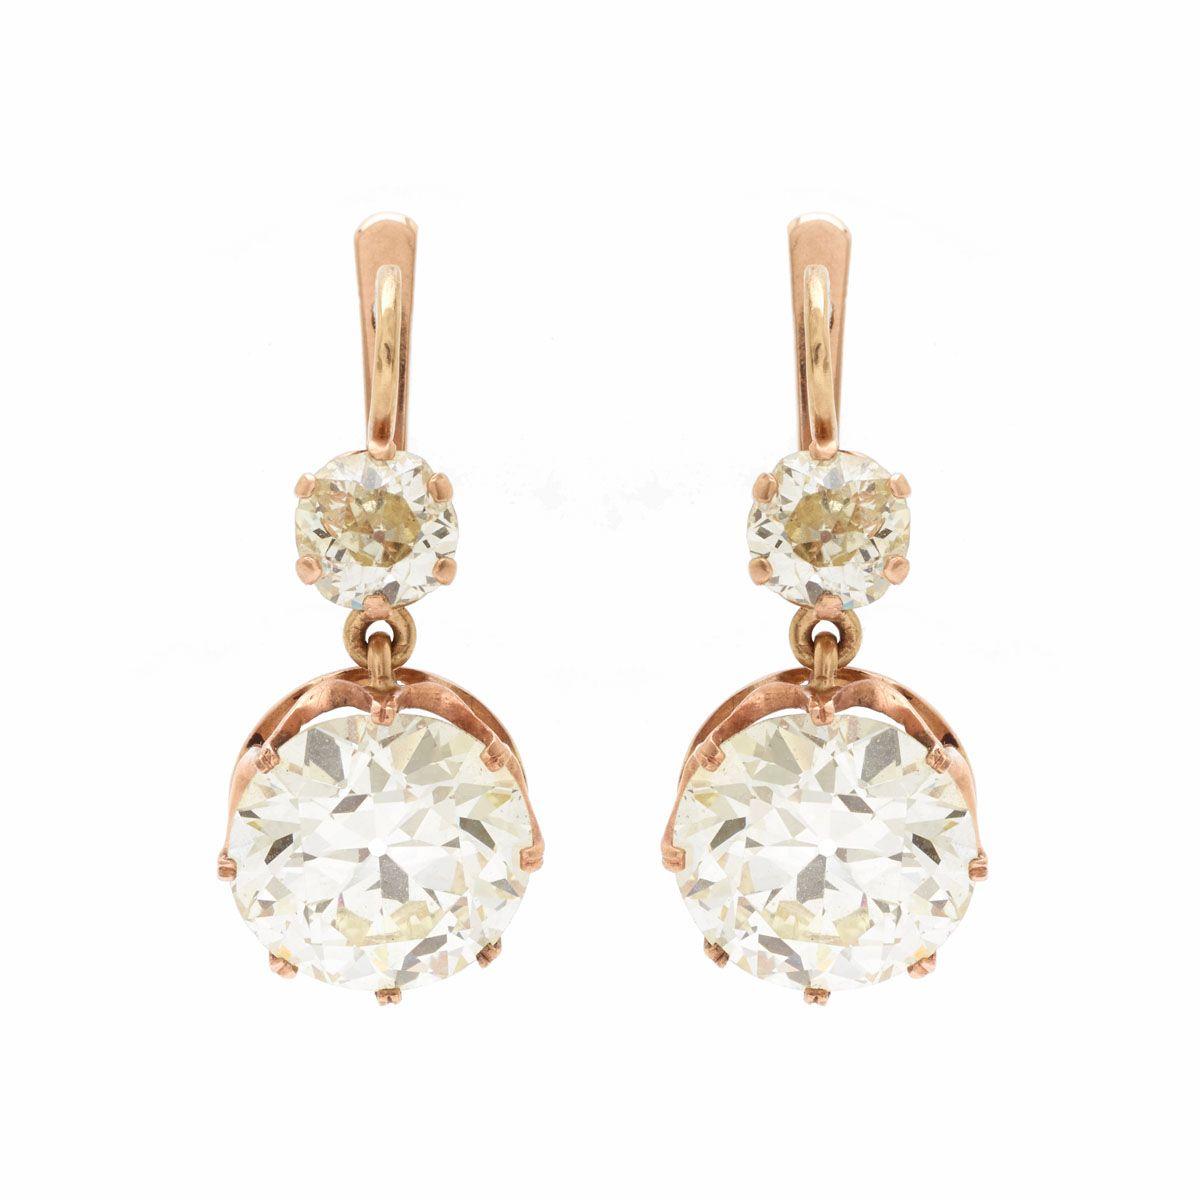 Victorian European Cut Diamond Rose Gold Drop Earrings Las Spectacular 14kt Era